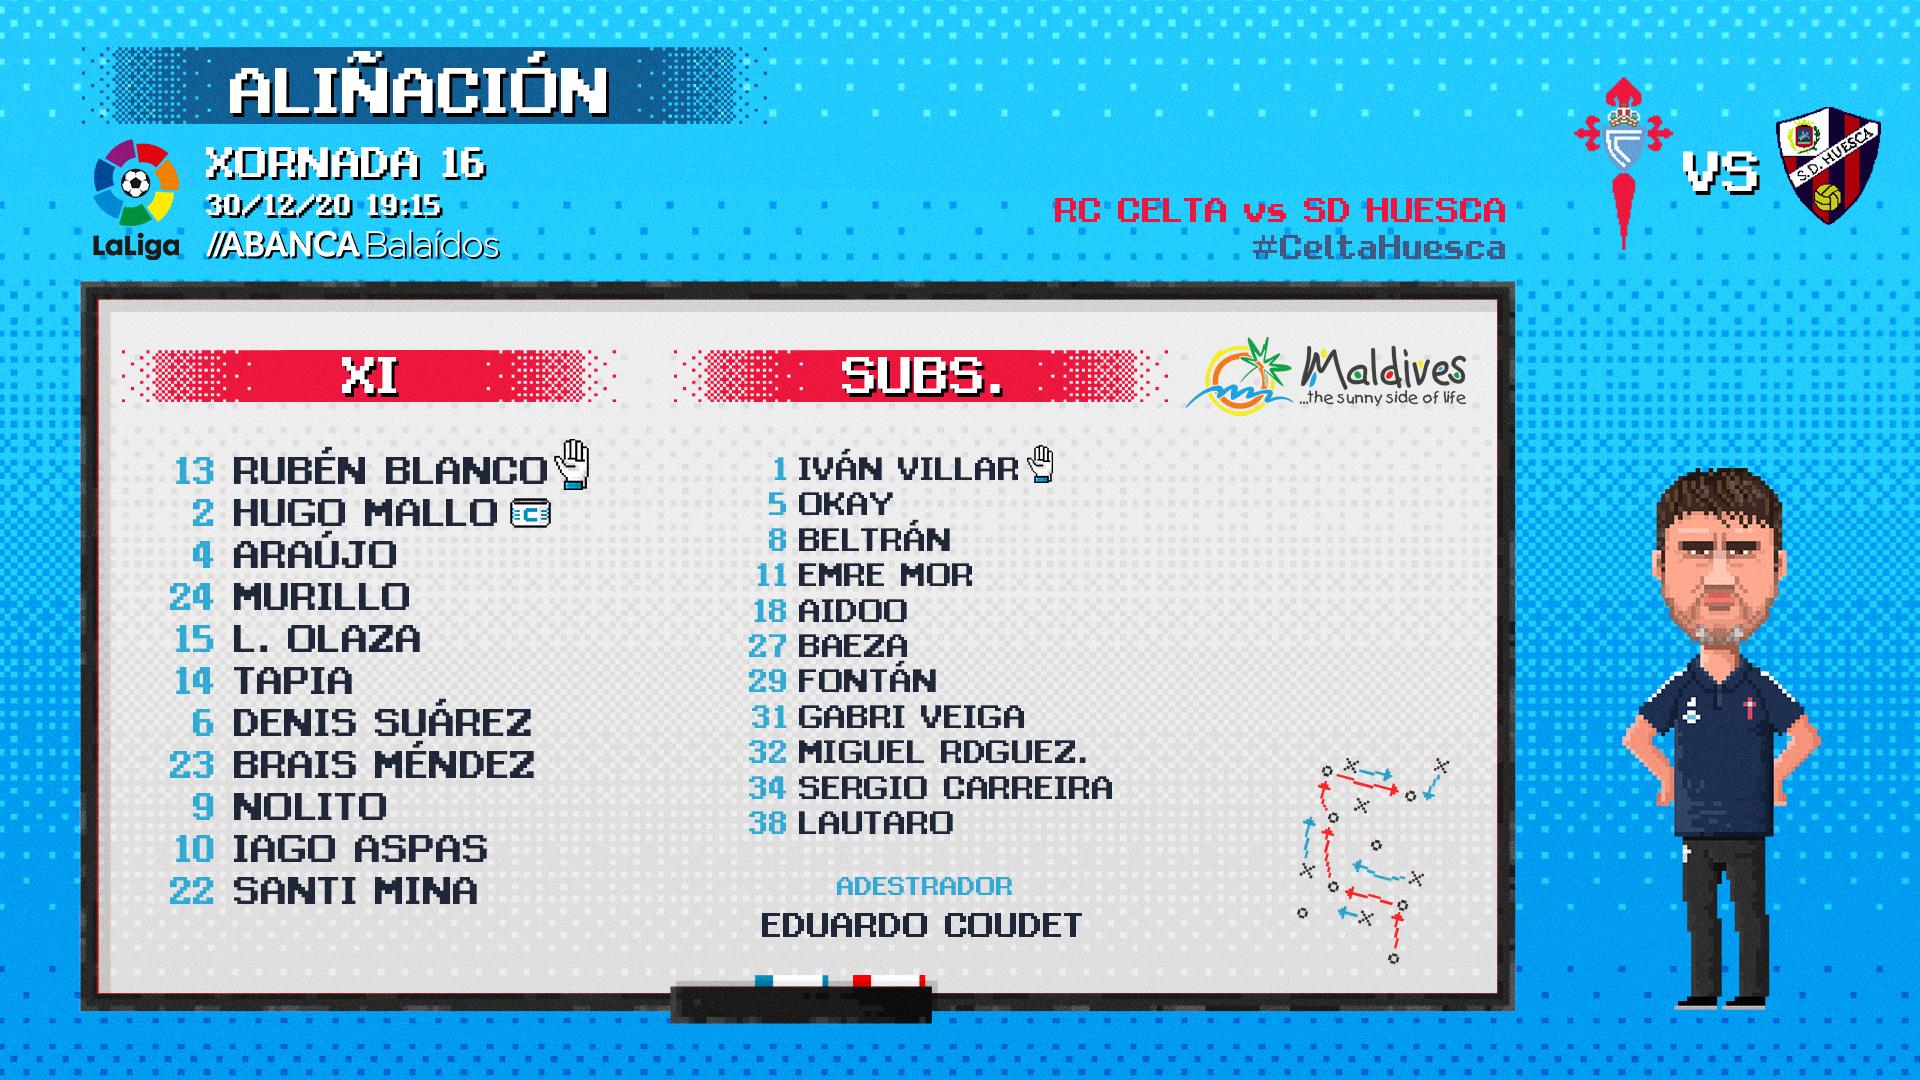 Real Club Celta de Vigo - Página 10 EqgG5A9XIAITDkz?format=jpg&name=large